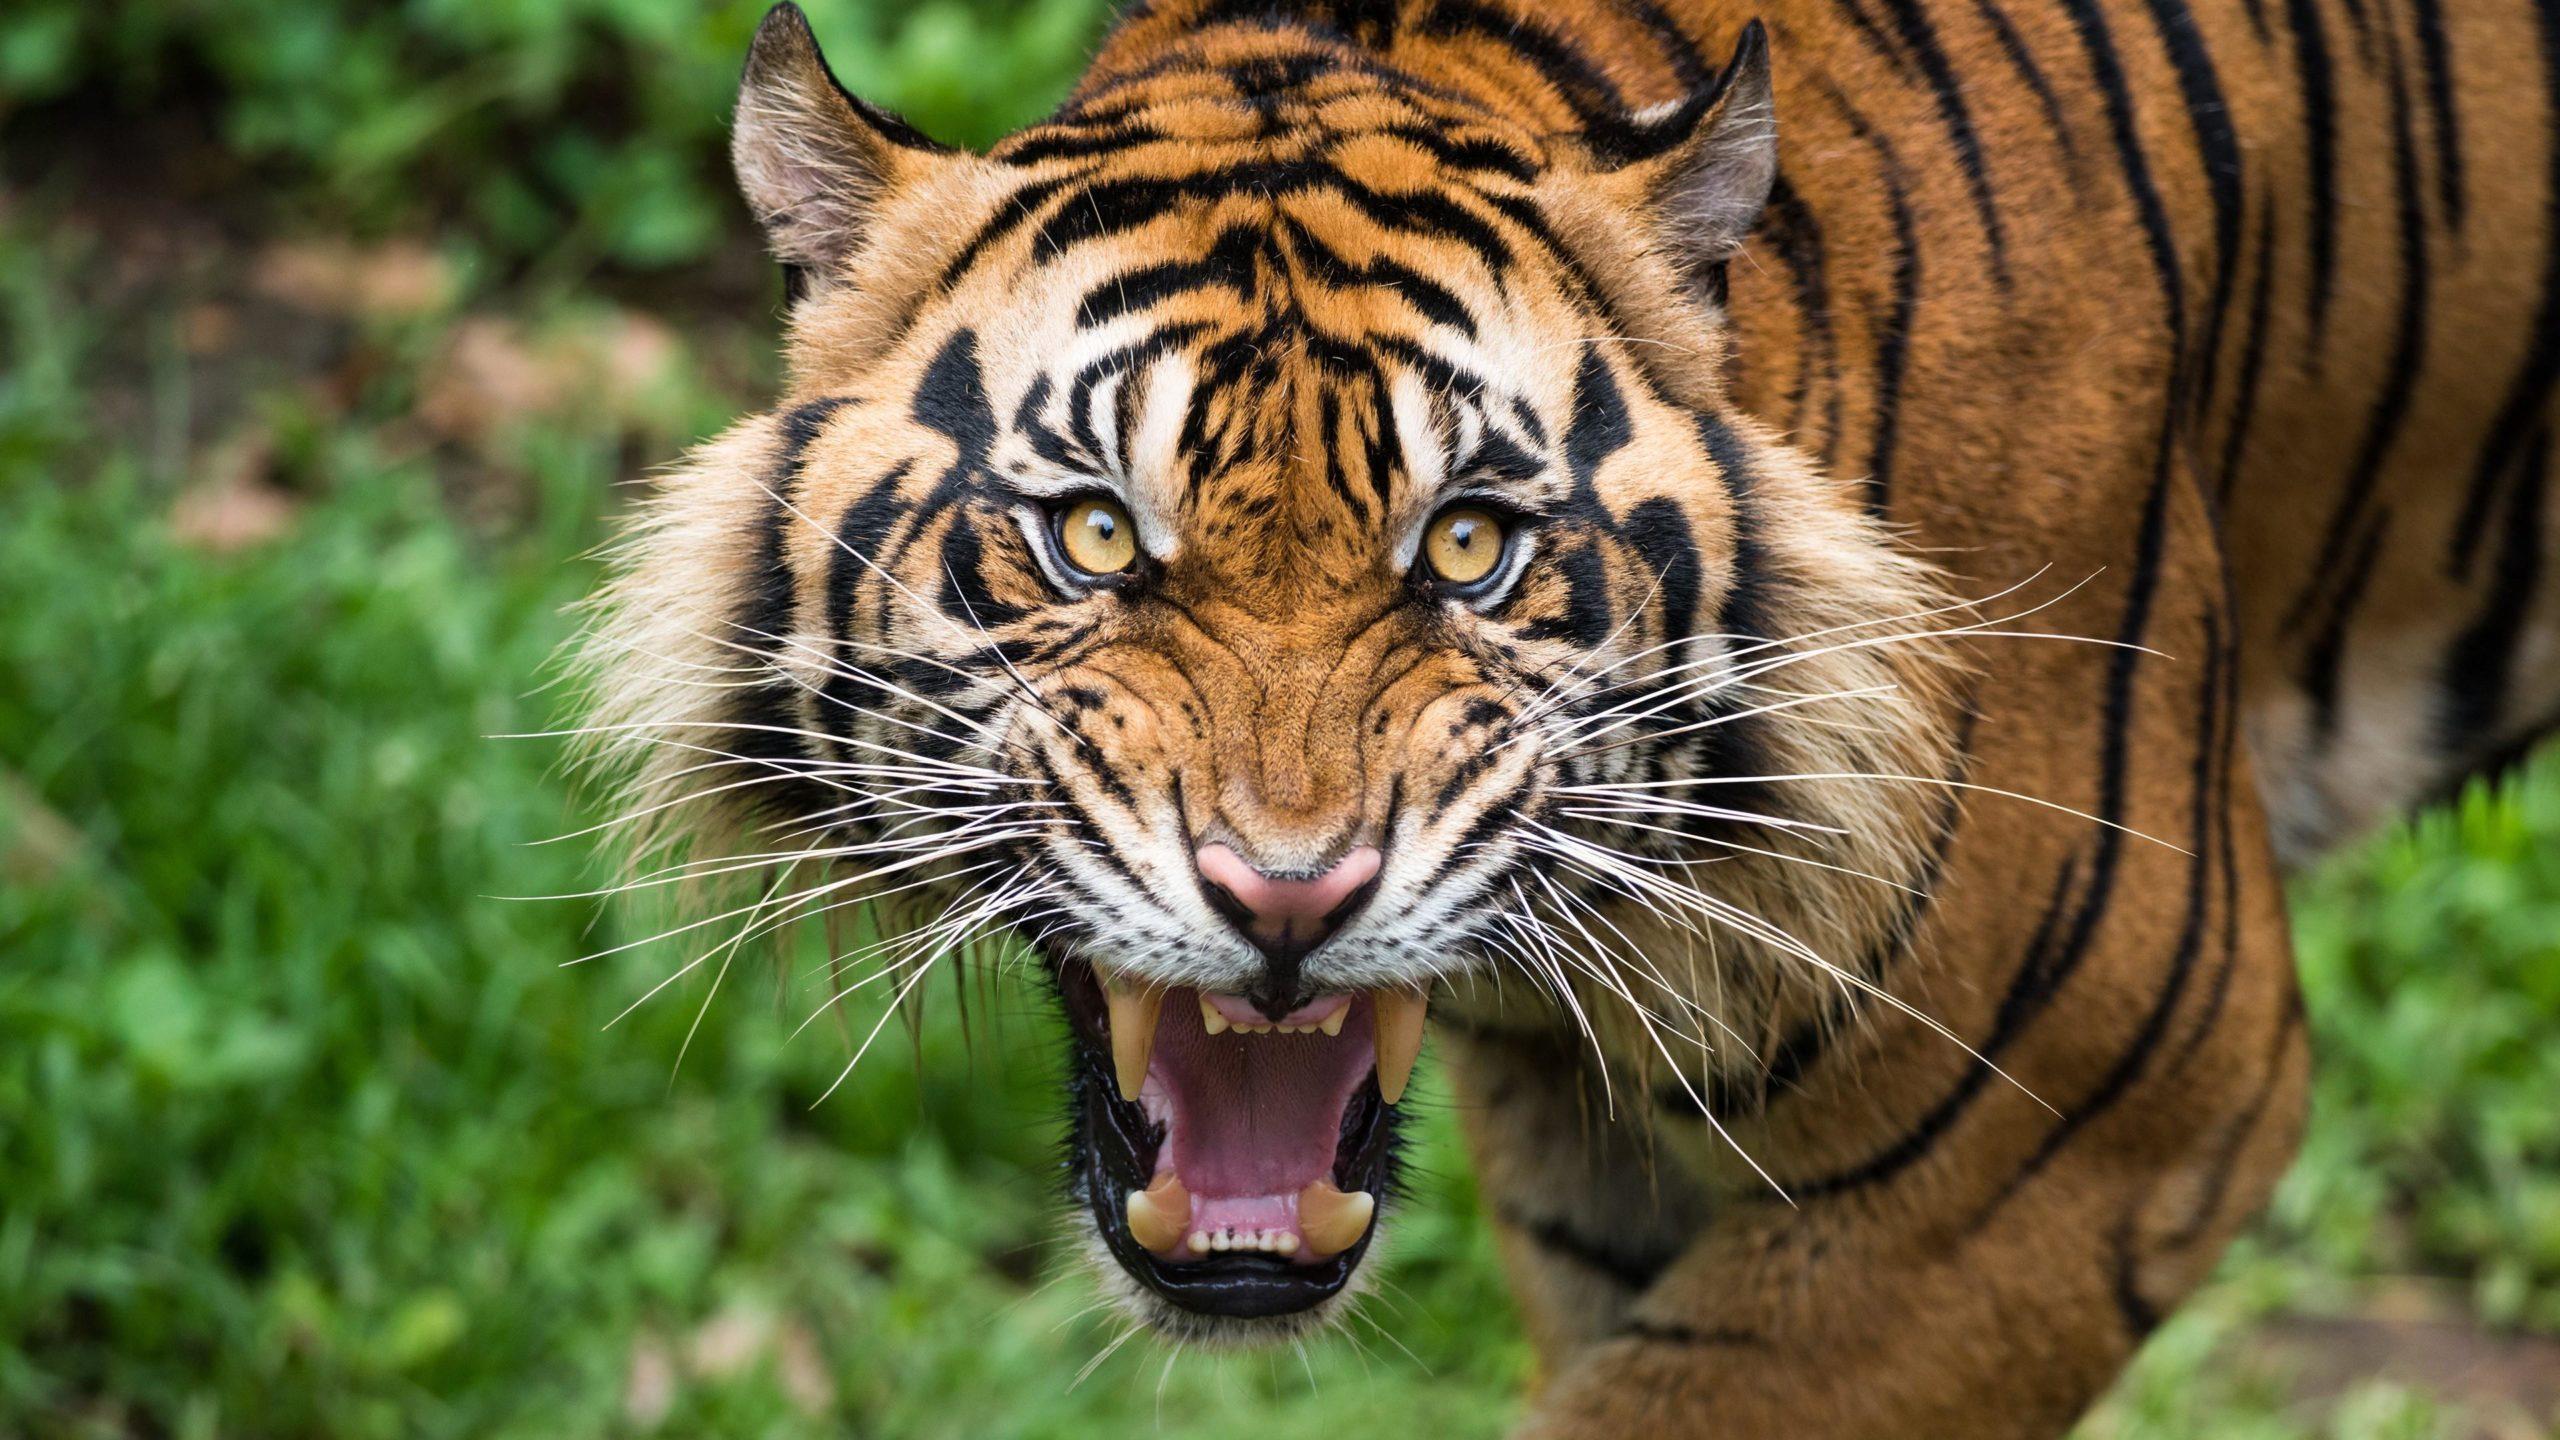 tiger images hd